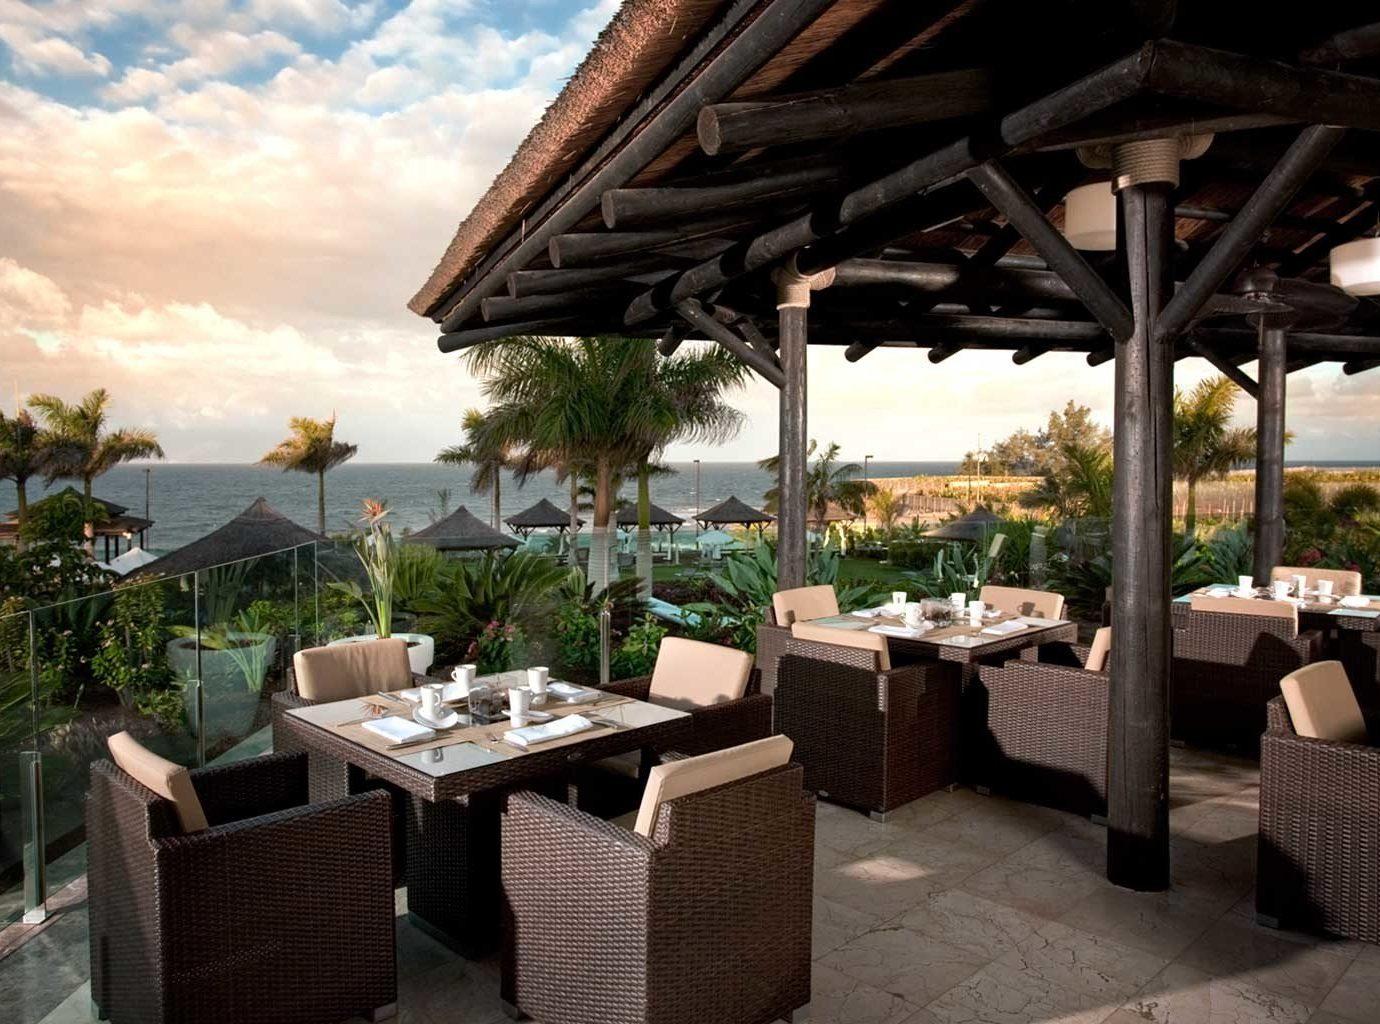 Hip Living Lounge Luxury Modern Trip Ideas outdoor Resort property restaurant estate vacation Villa furniture several